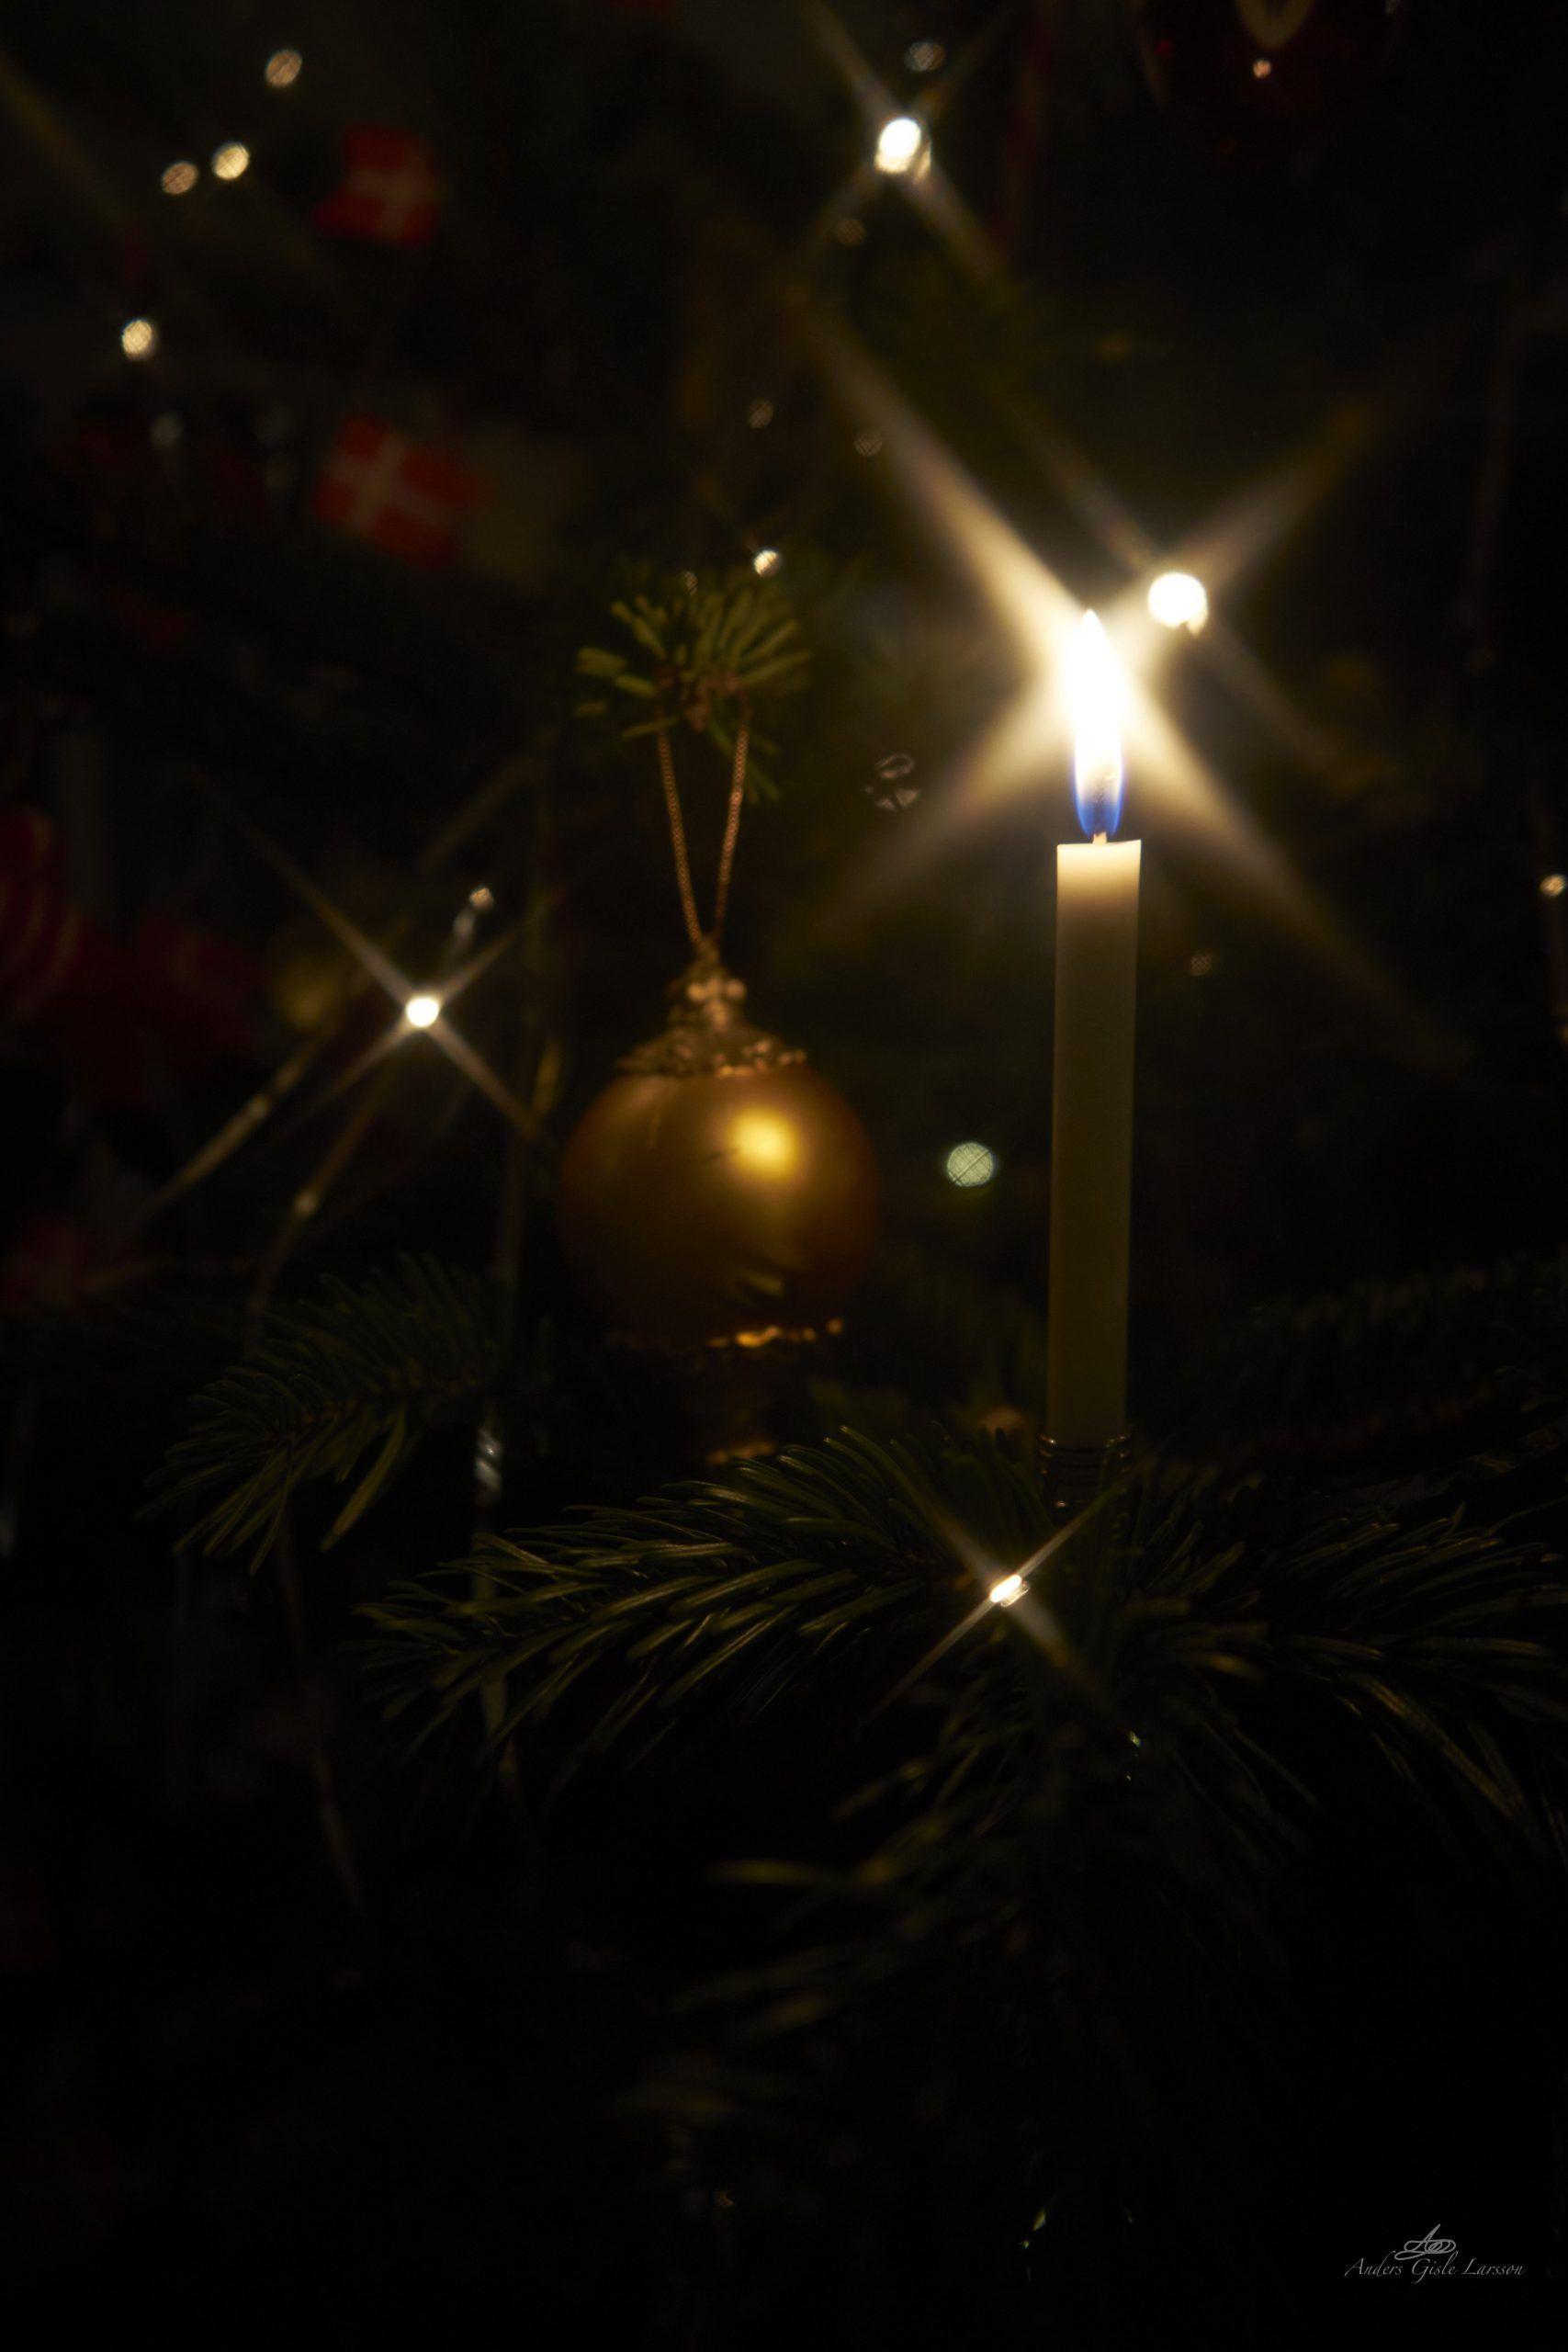 Et lys i mørket, Uge 52, Juleaften, Skovby, Aarhus